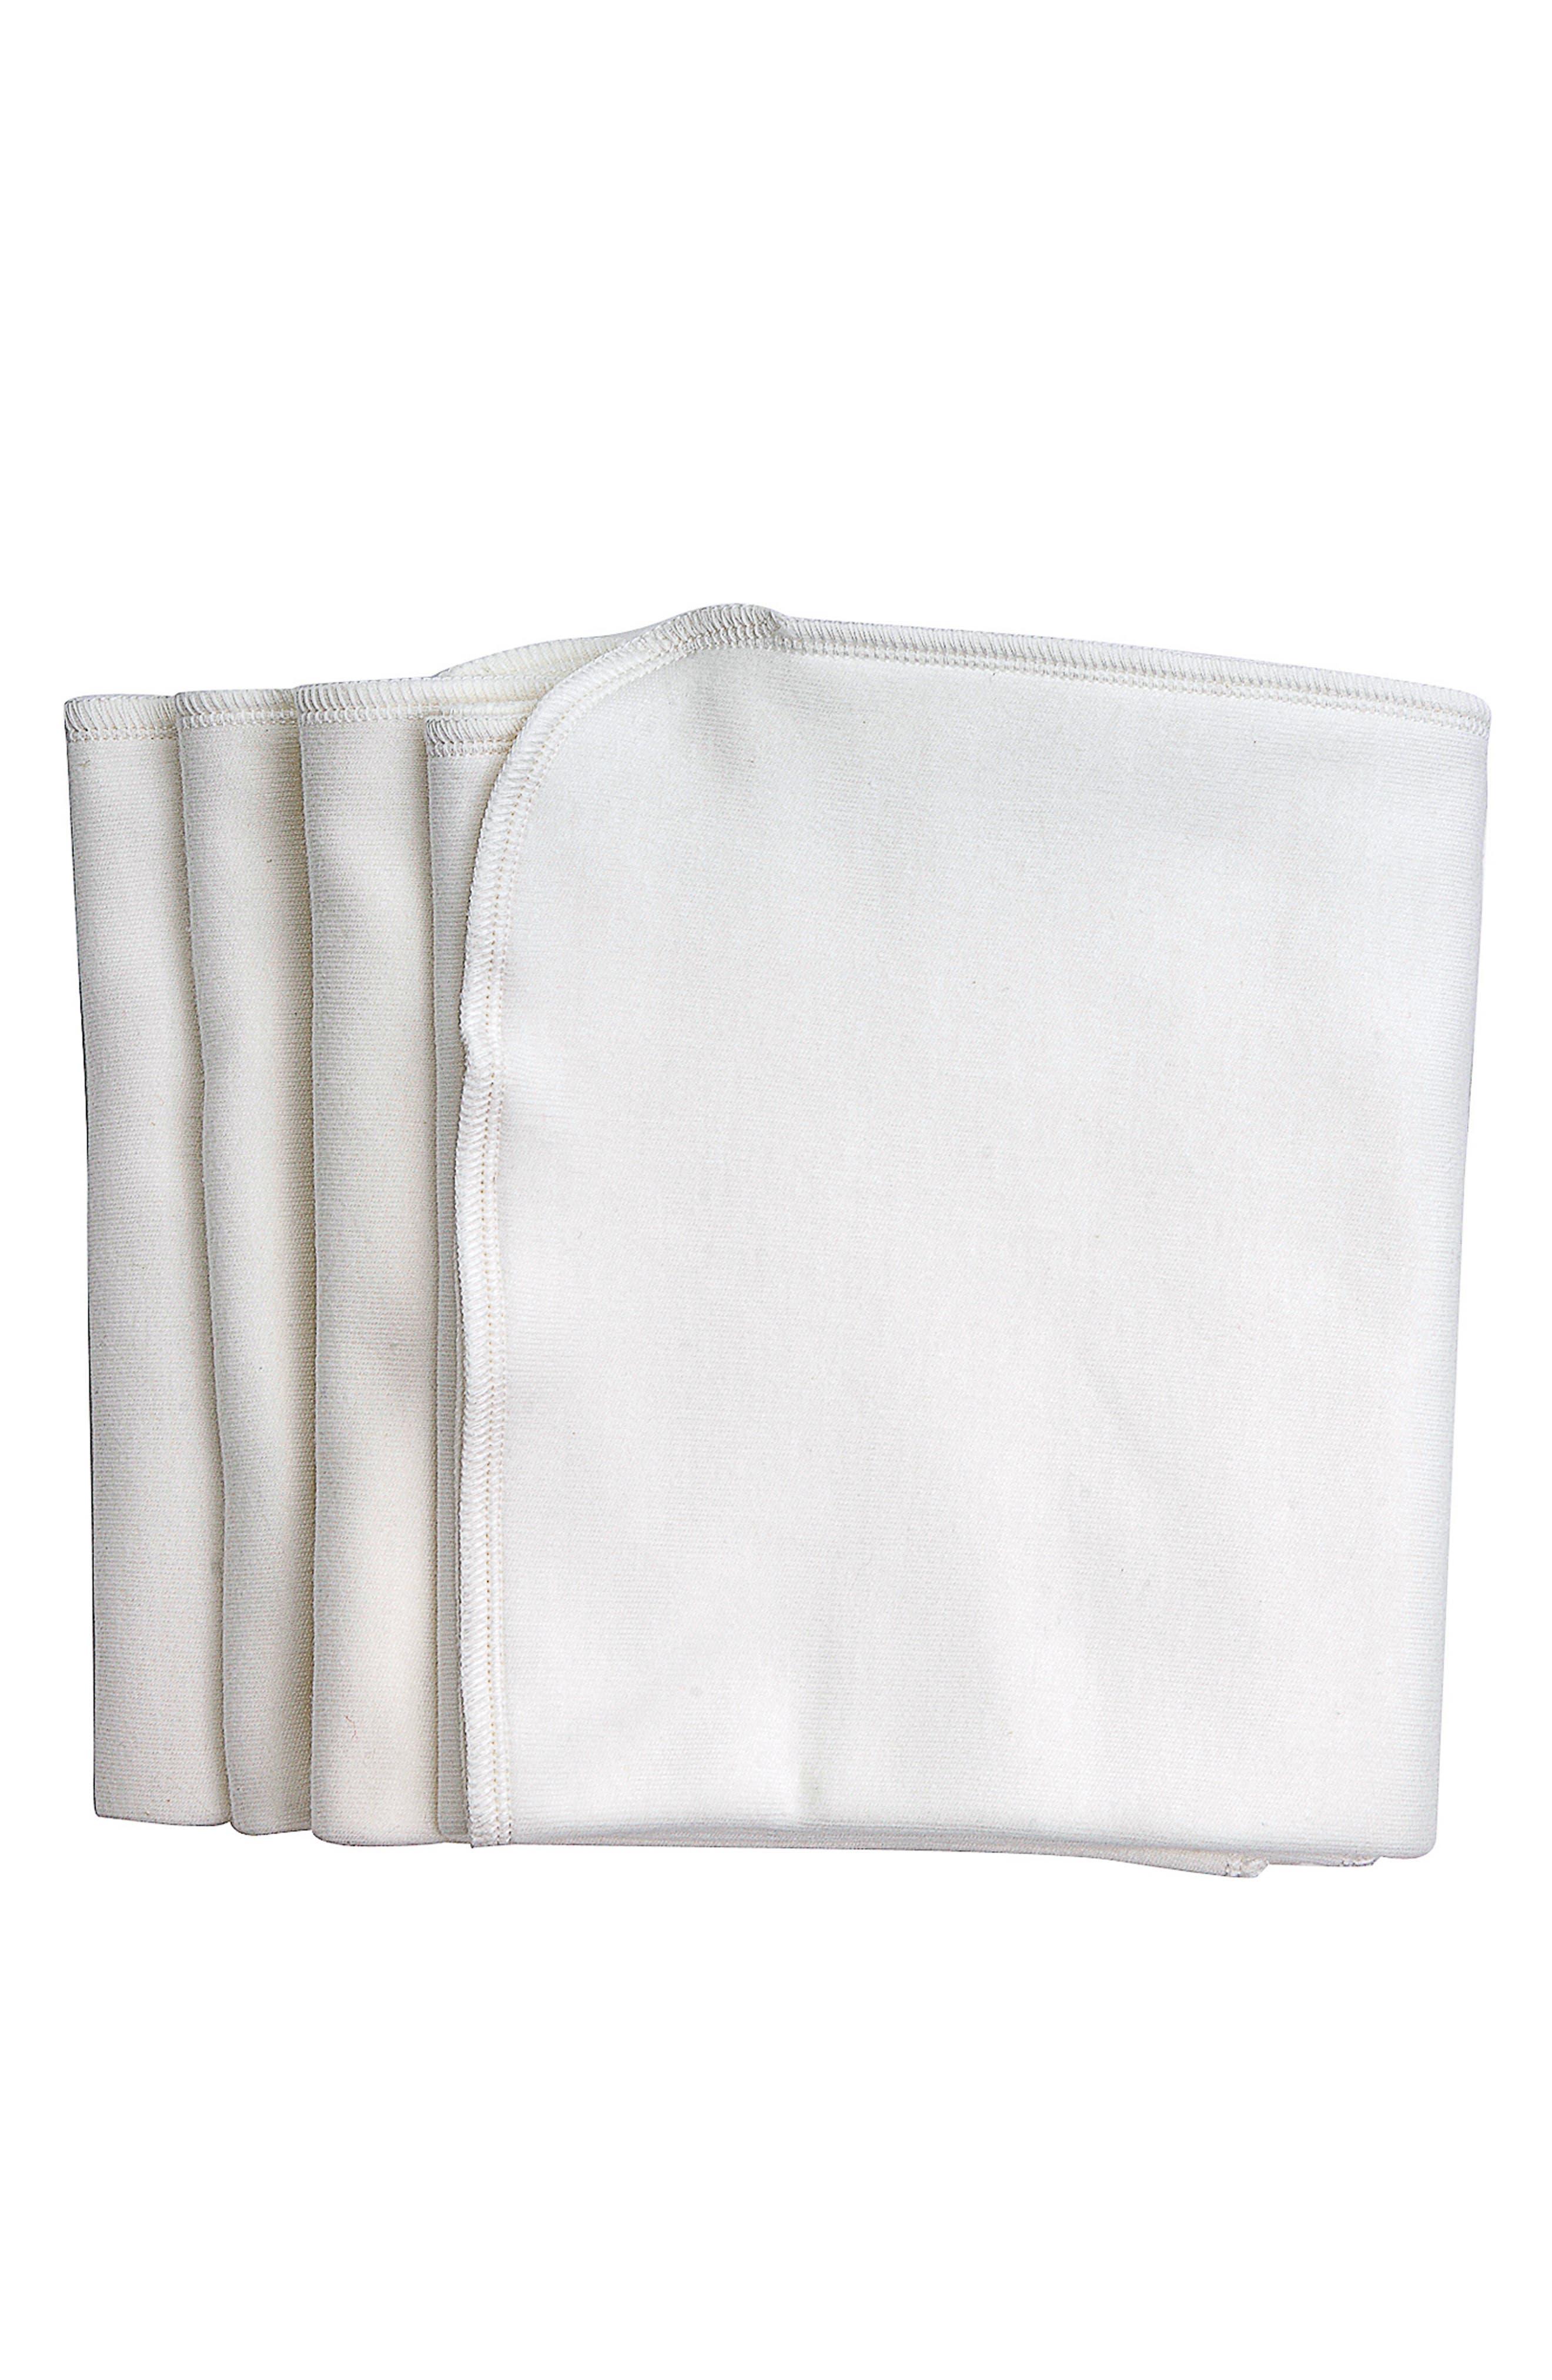 4-Pack Organic Egyptian Cotton Burp Cloths,                             Main thumbnail 1, color,                             900